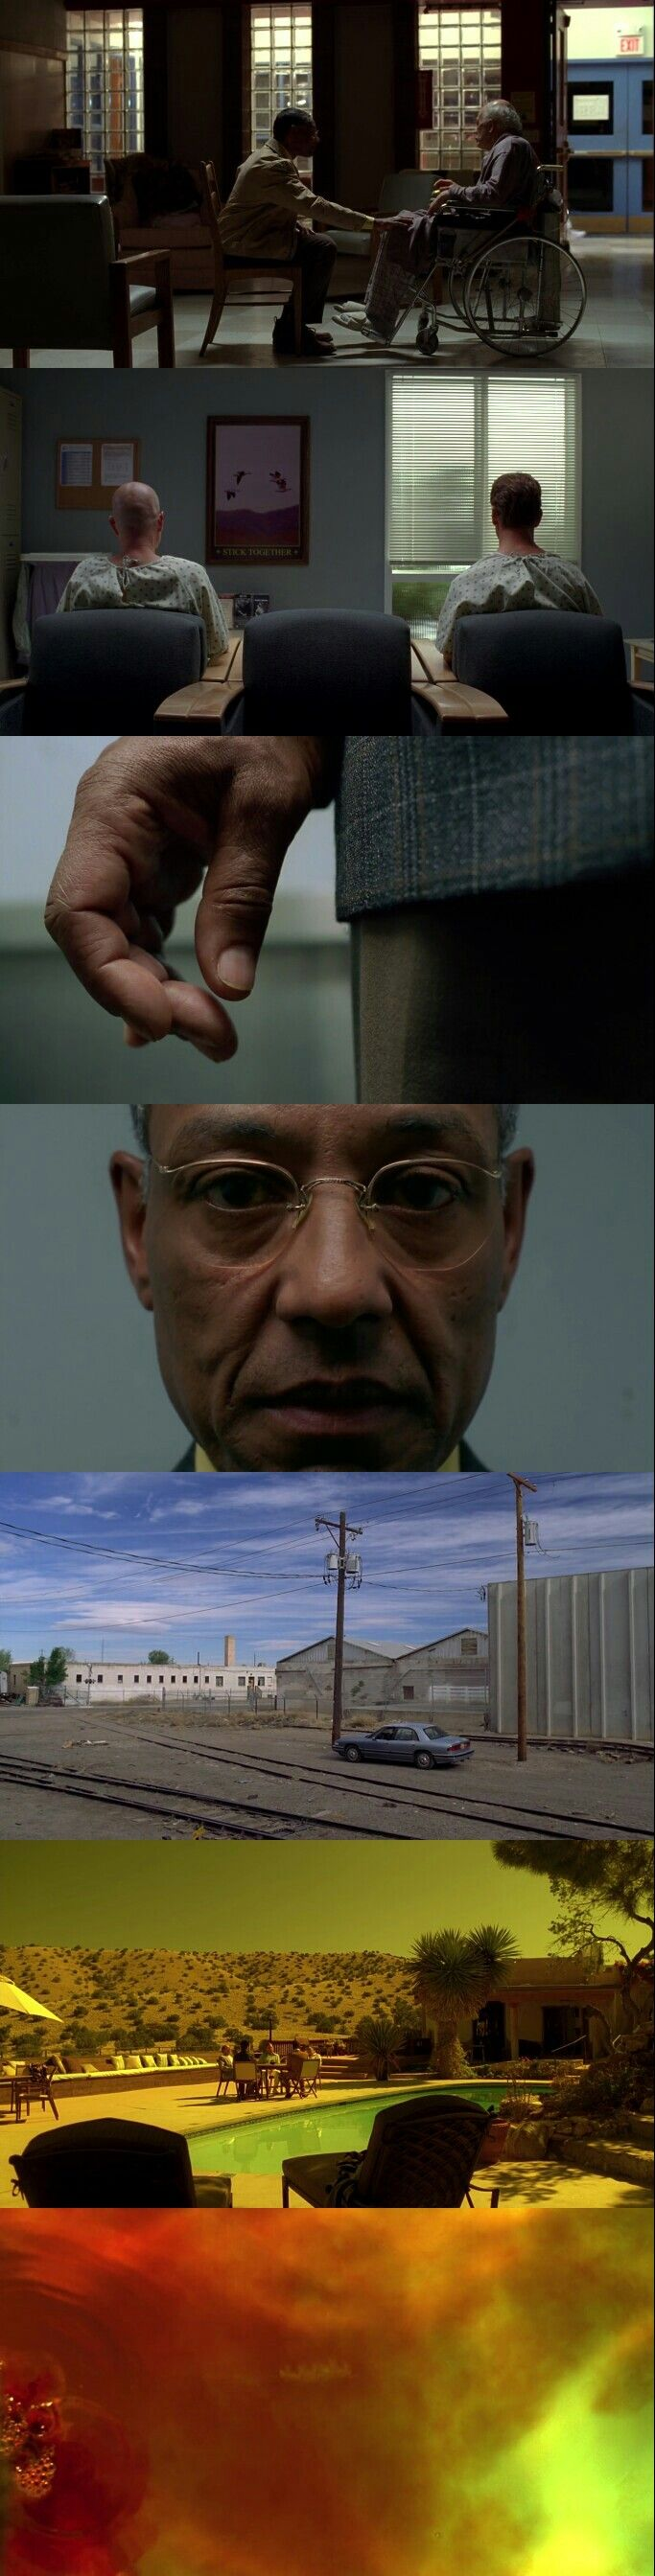 Breaking Bad (2008 - 2013) Season 4 Episode 8: Hermanos